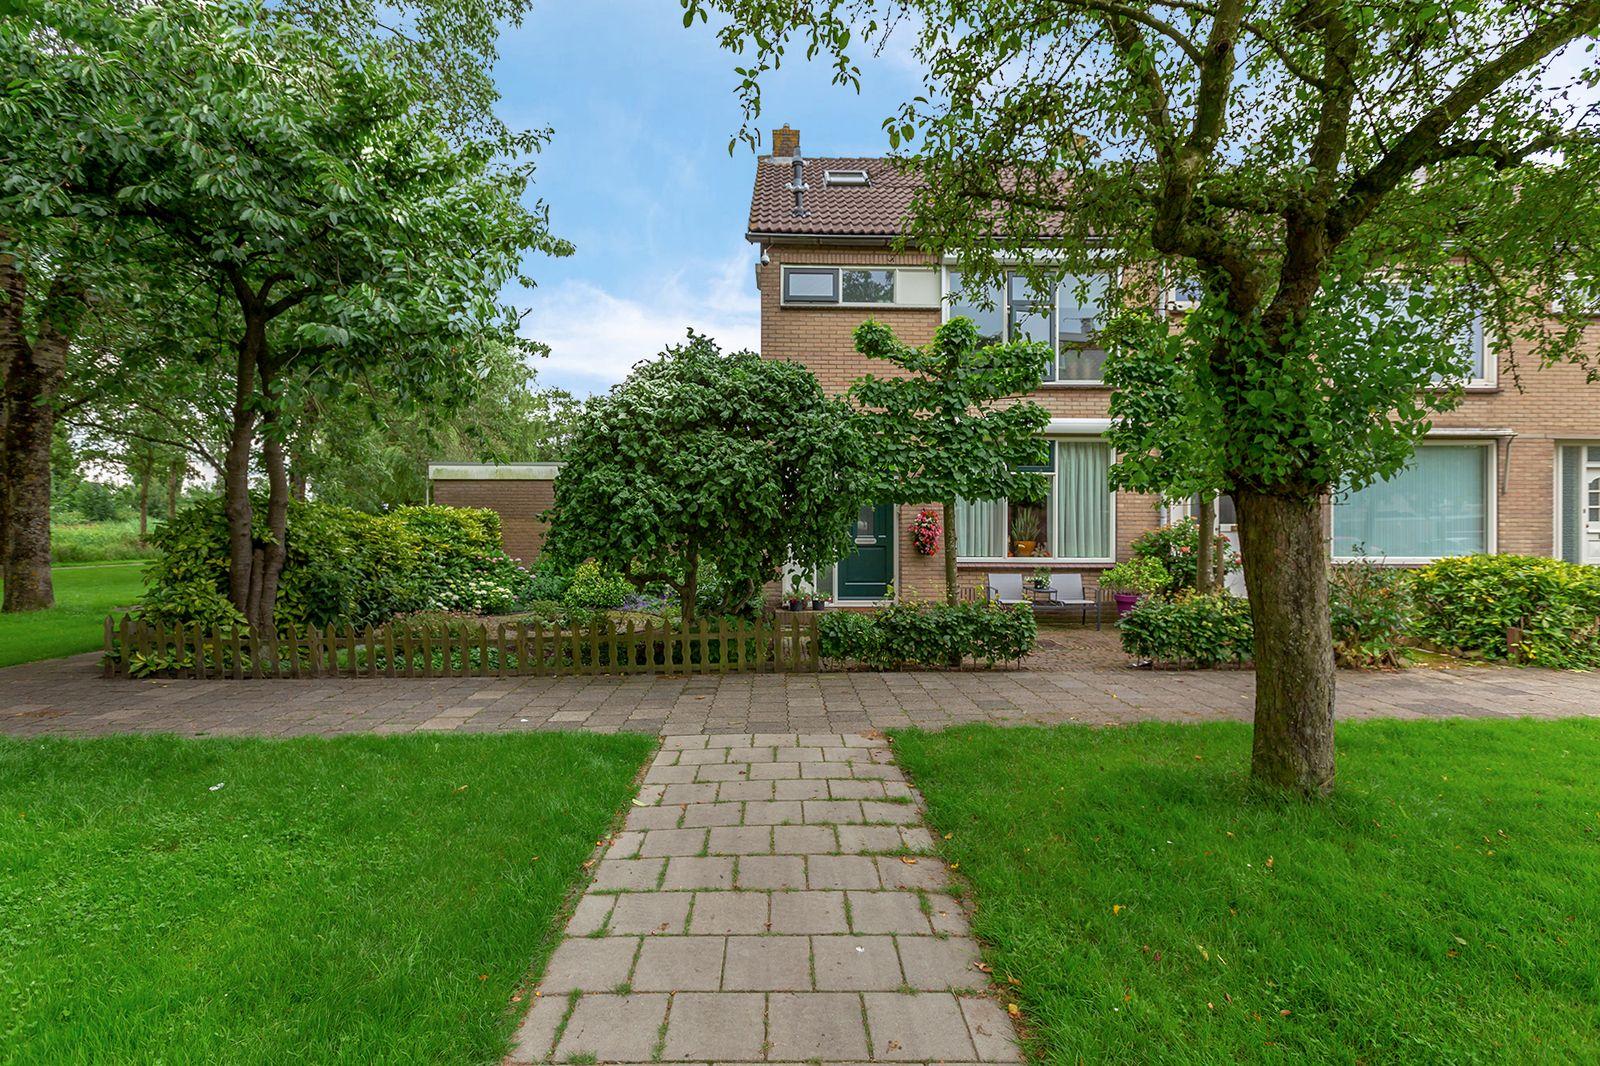 Beiershof 42, Bodegraven